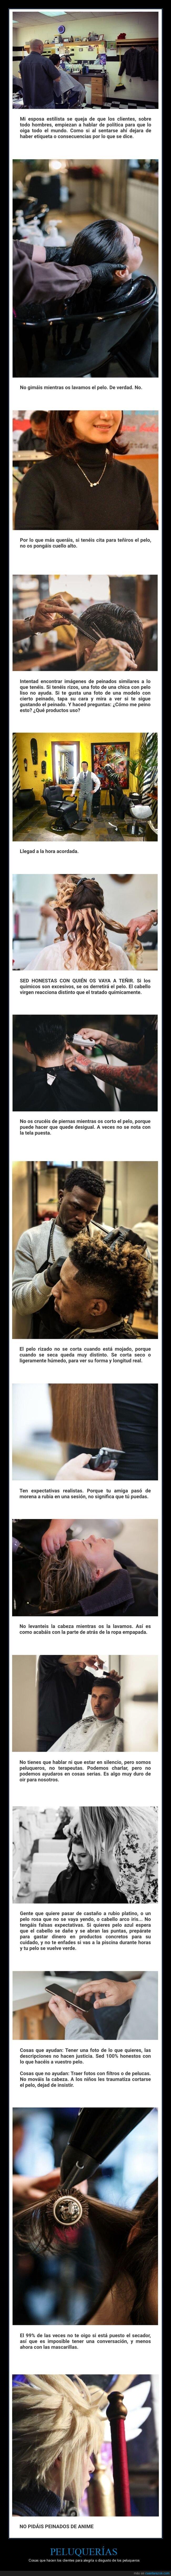 clientes,peluquerías,peluqueros